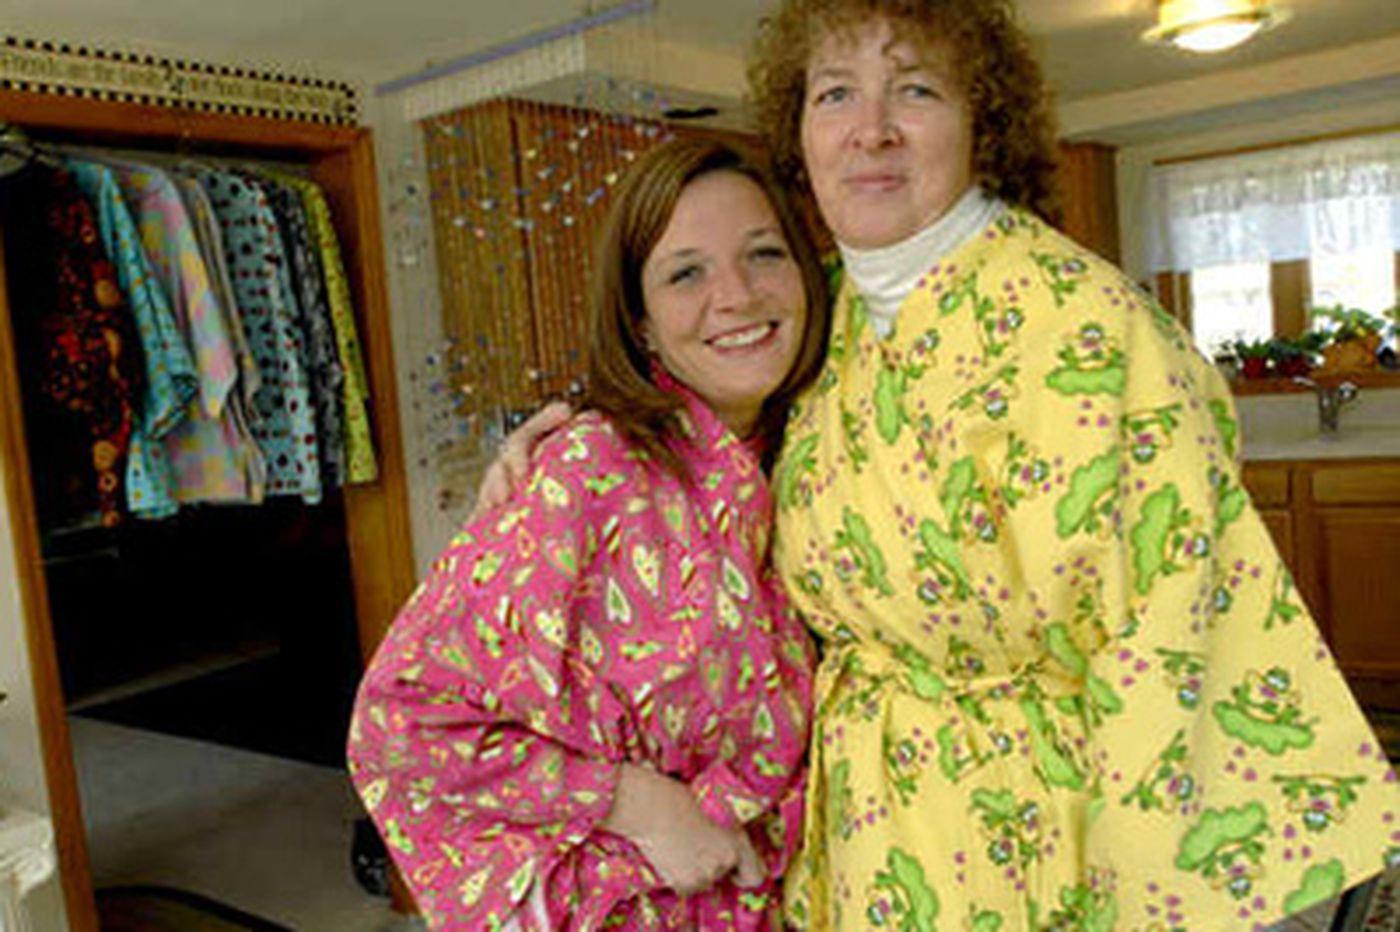 Daniel Rubin: A S.J. woman's therapeutic war on hospital gowns